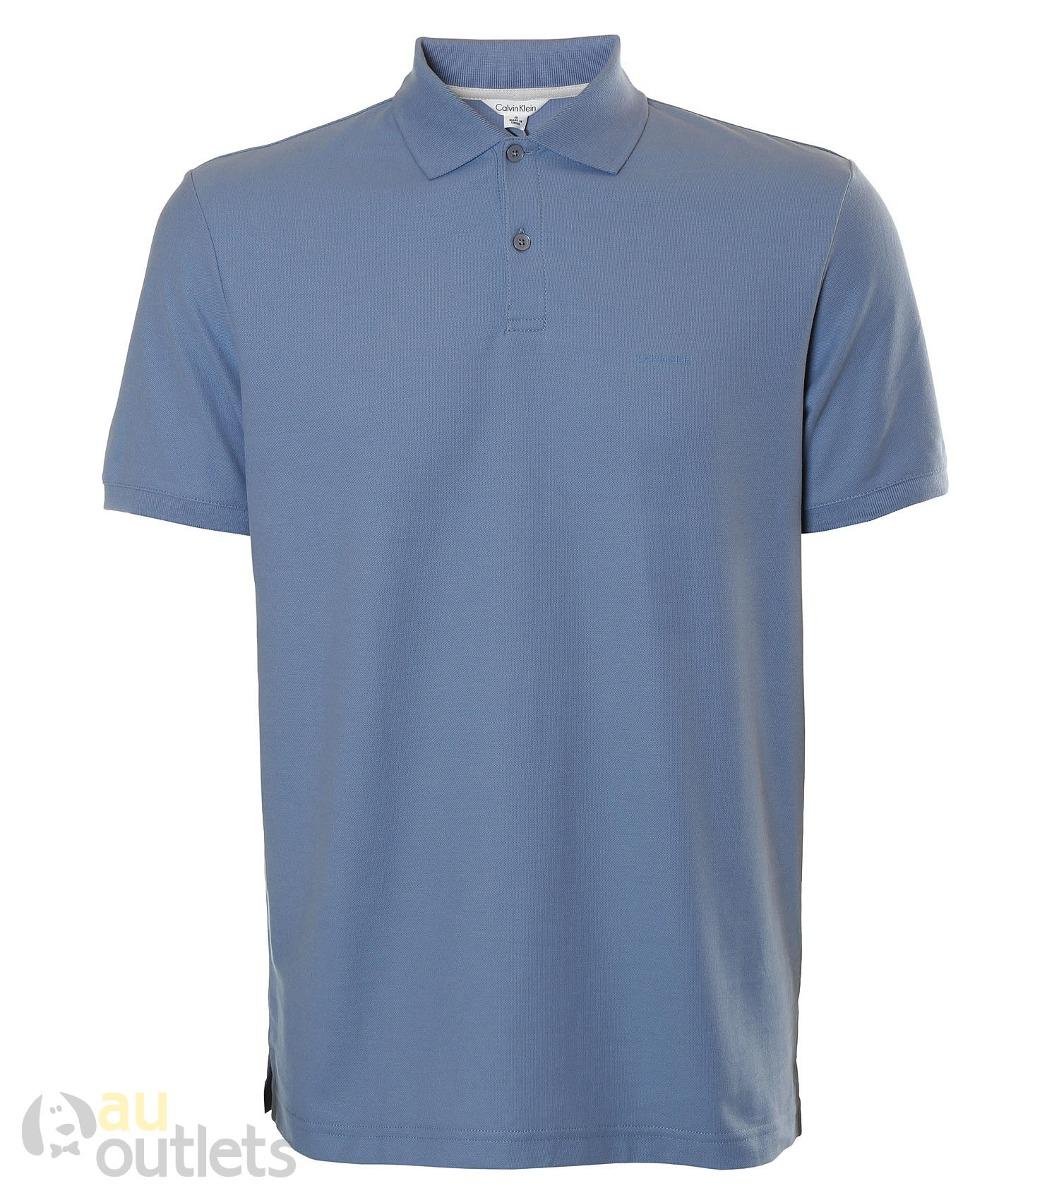 35f397953 Camisa Polo Masculina Calvin Klein Phoenix - R$ 337,87 em Mercado Livre